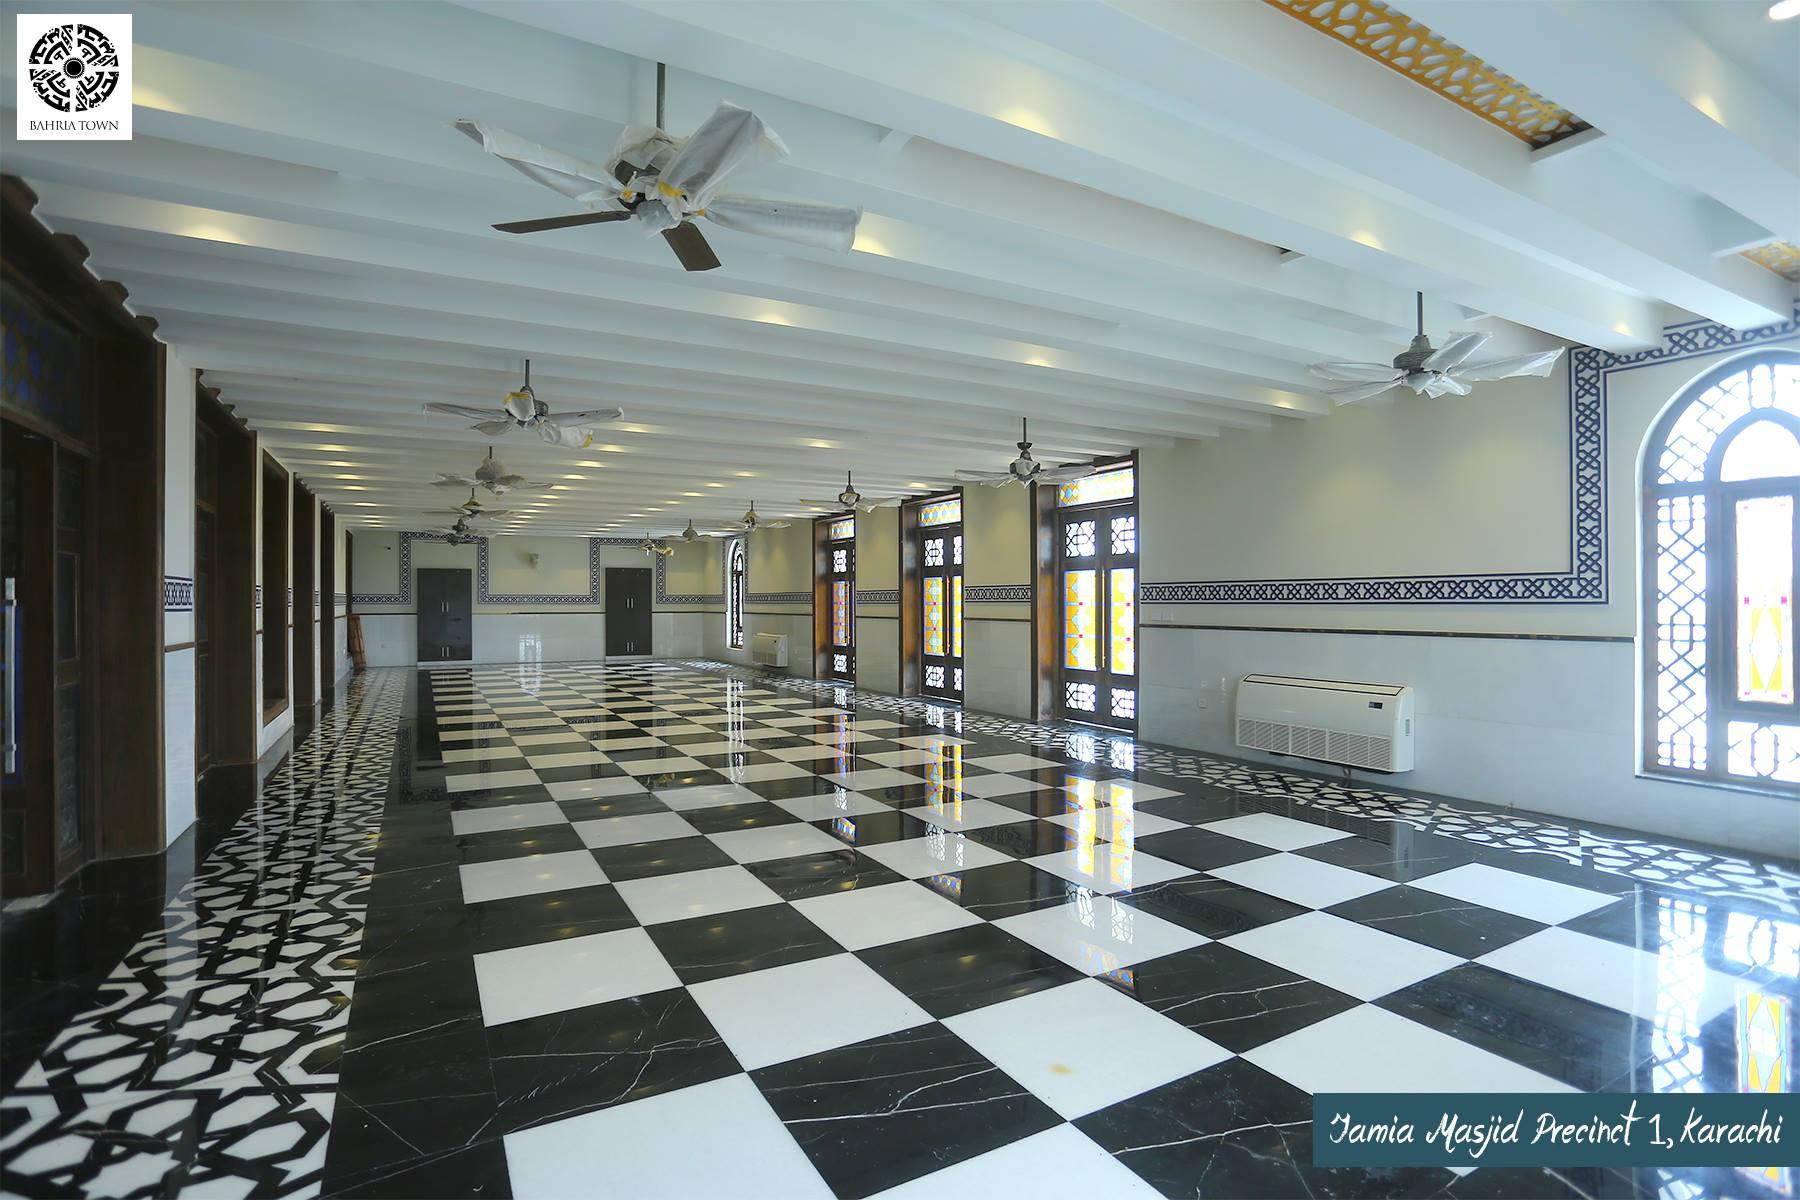 Jamia Masjid – Precinct 1 Bahria Town Karachi10